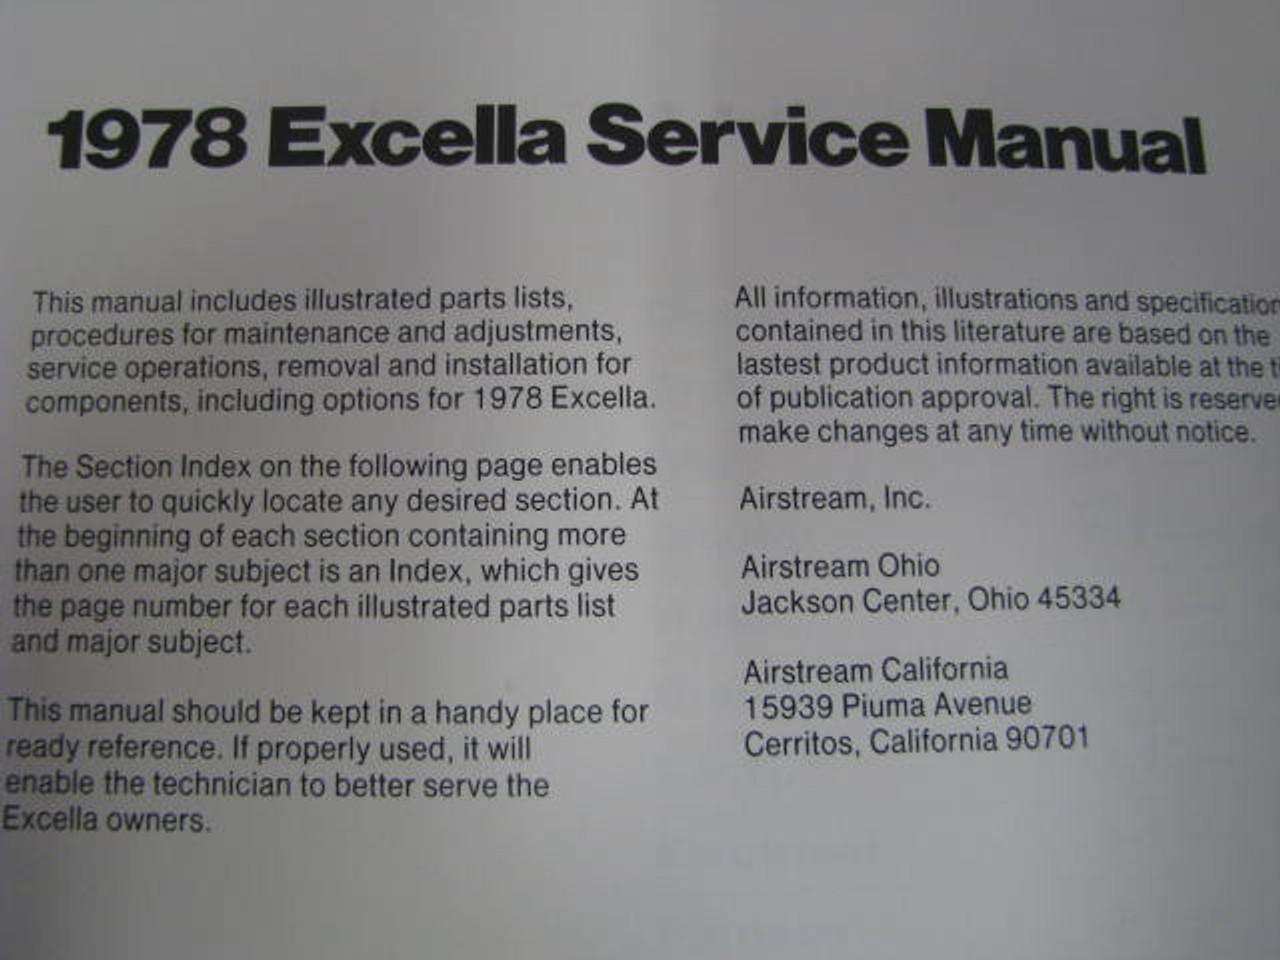 1978 Airstream Excella Service Manual (BL014) INTERIOR PAGE